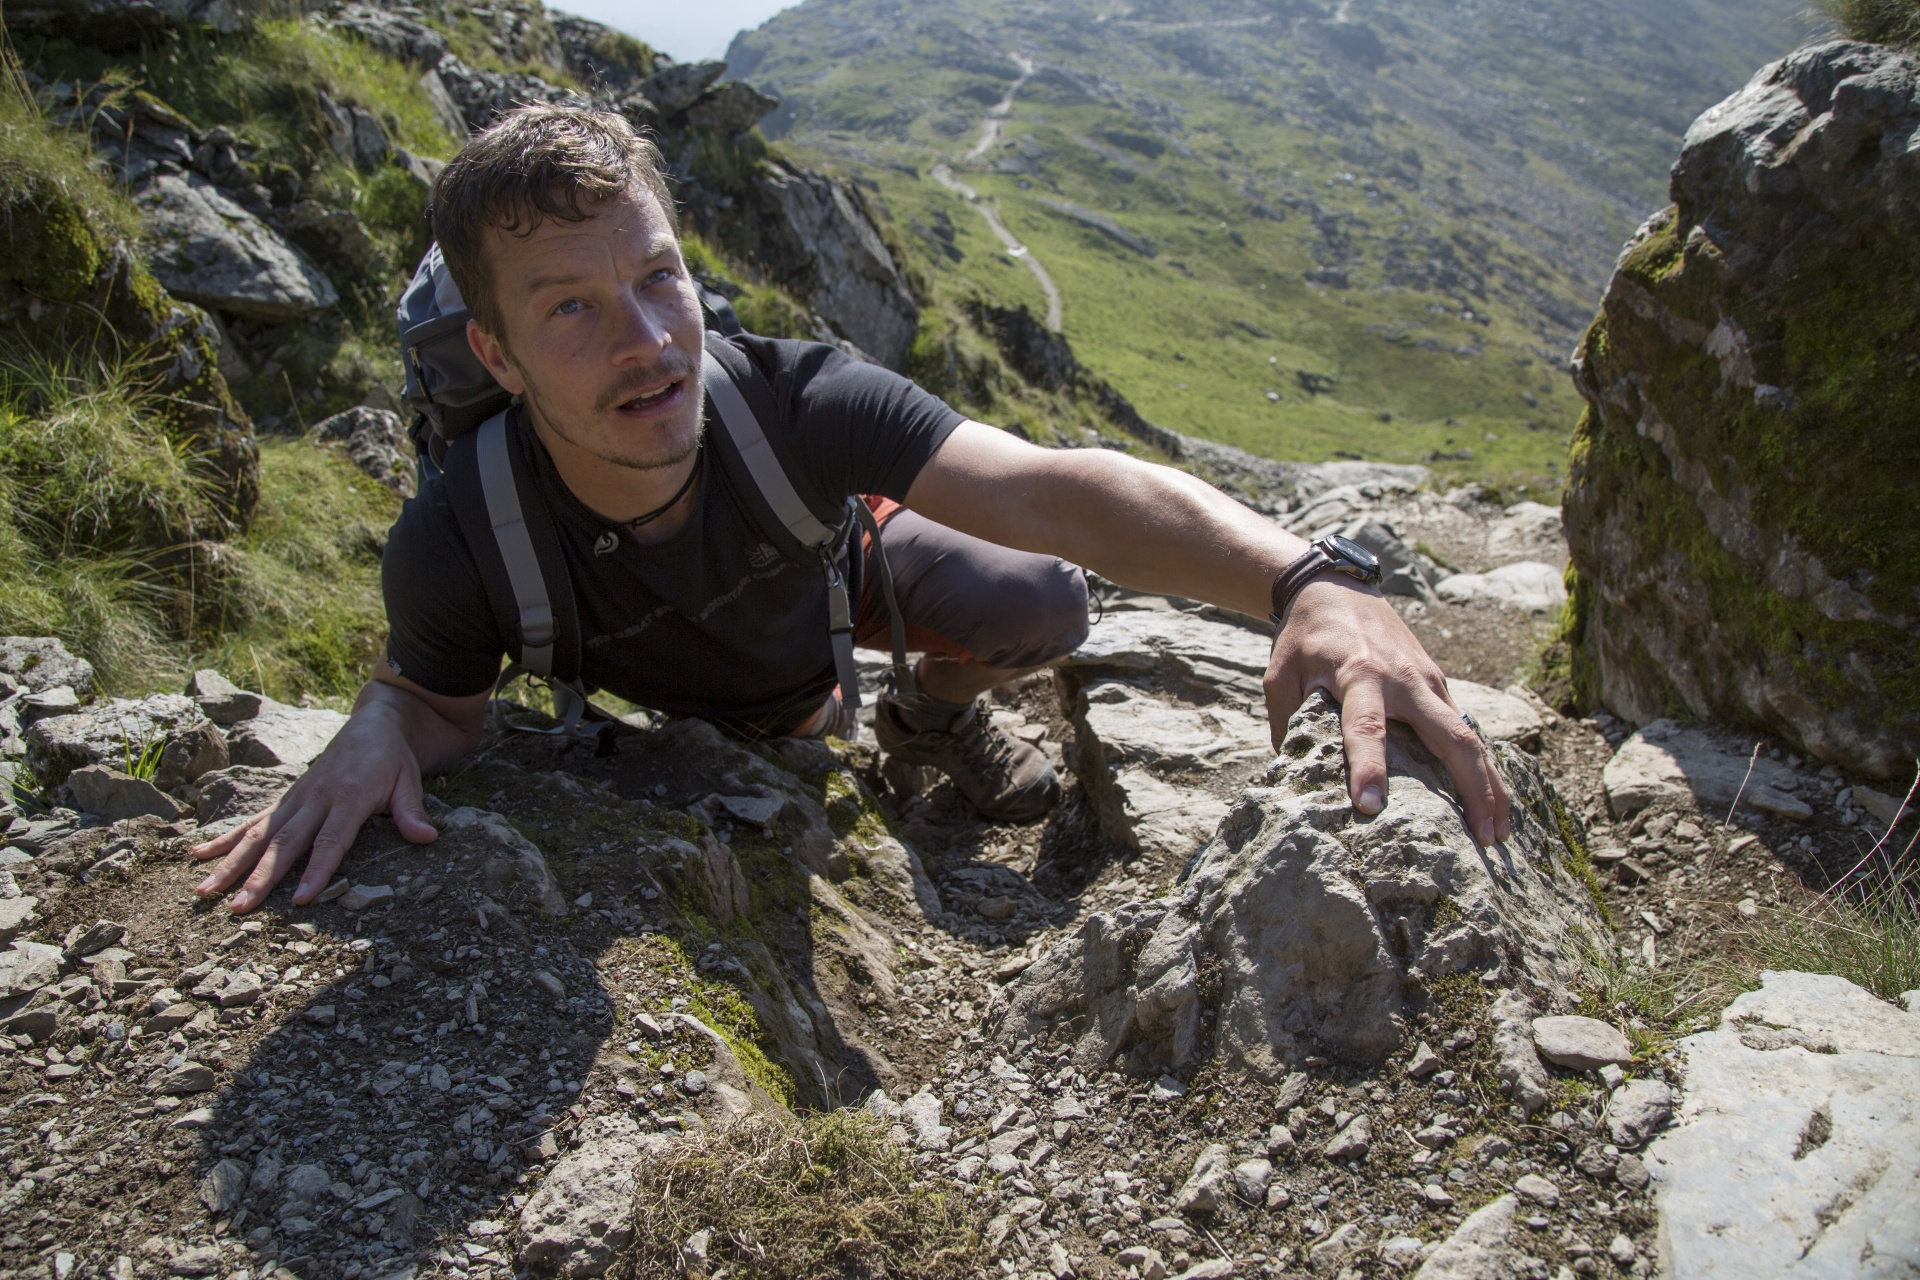 Hiking, Mountin Climbing